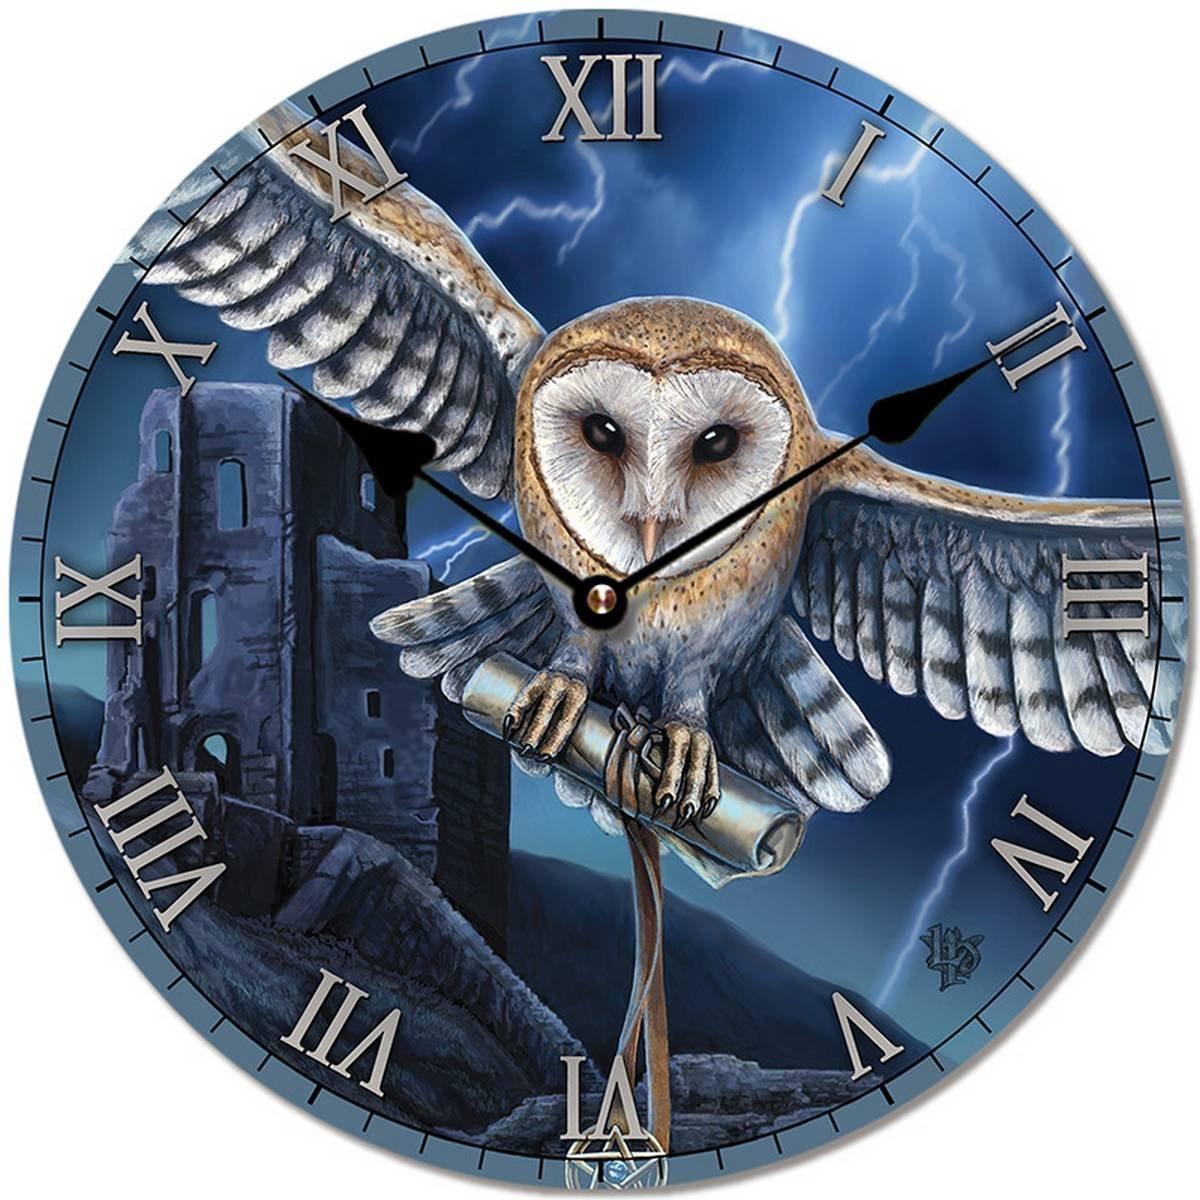 Decorative Fantasy Wall Clock - Heart of the Storm Owl Puckator